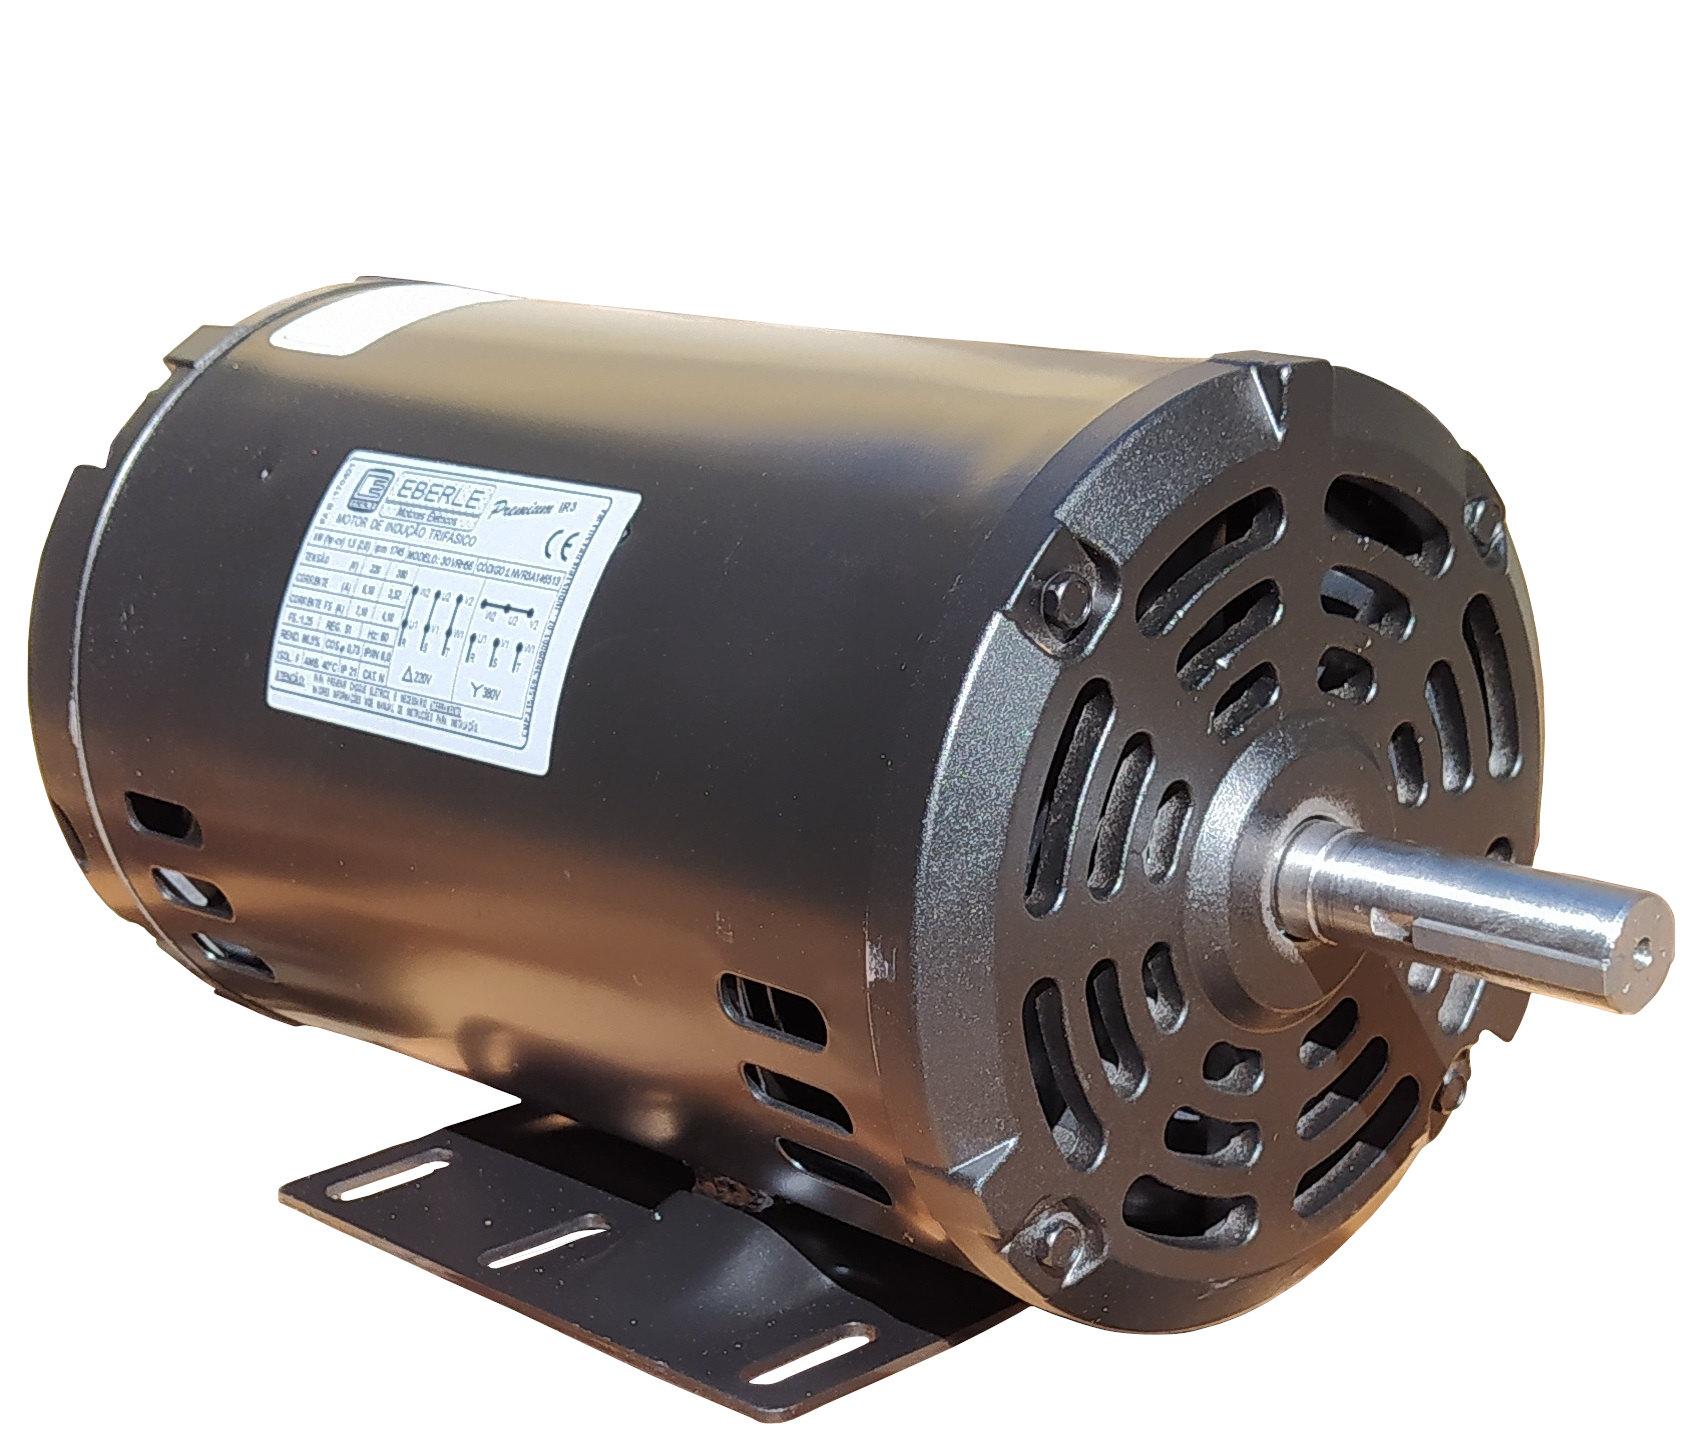 Motor Elétrico Trifásico 2cv 4 Polos Baixa Rotação 220/380v Aberto IP21 Eberle Mercosul IR3